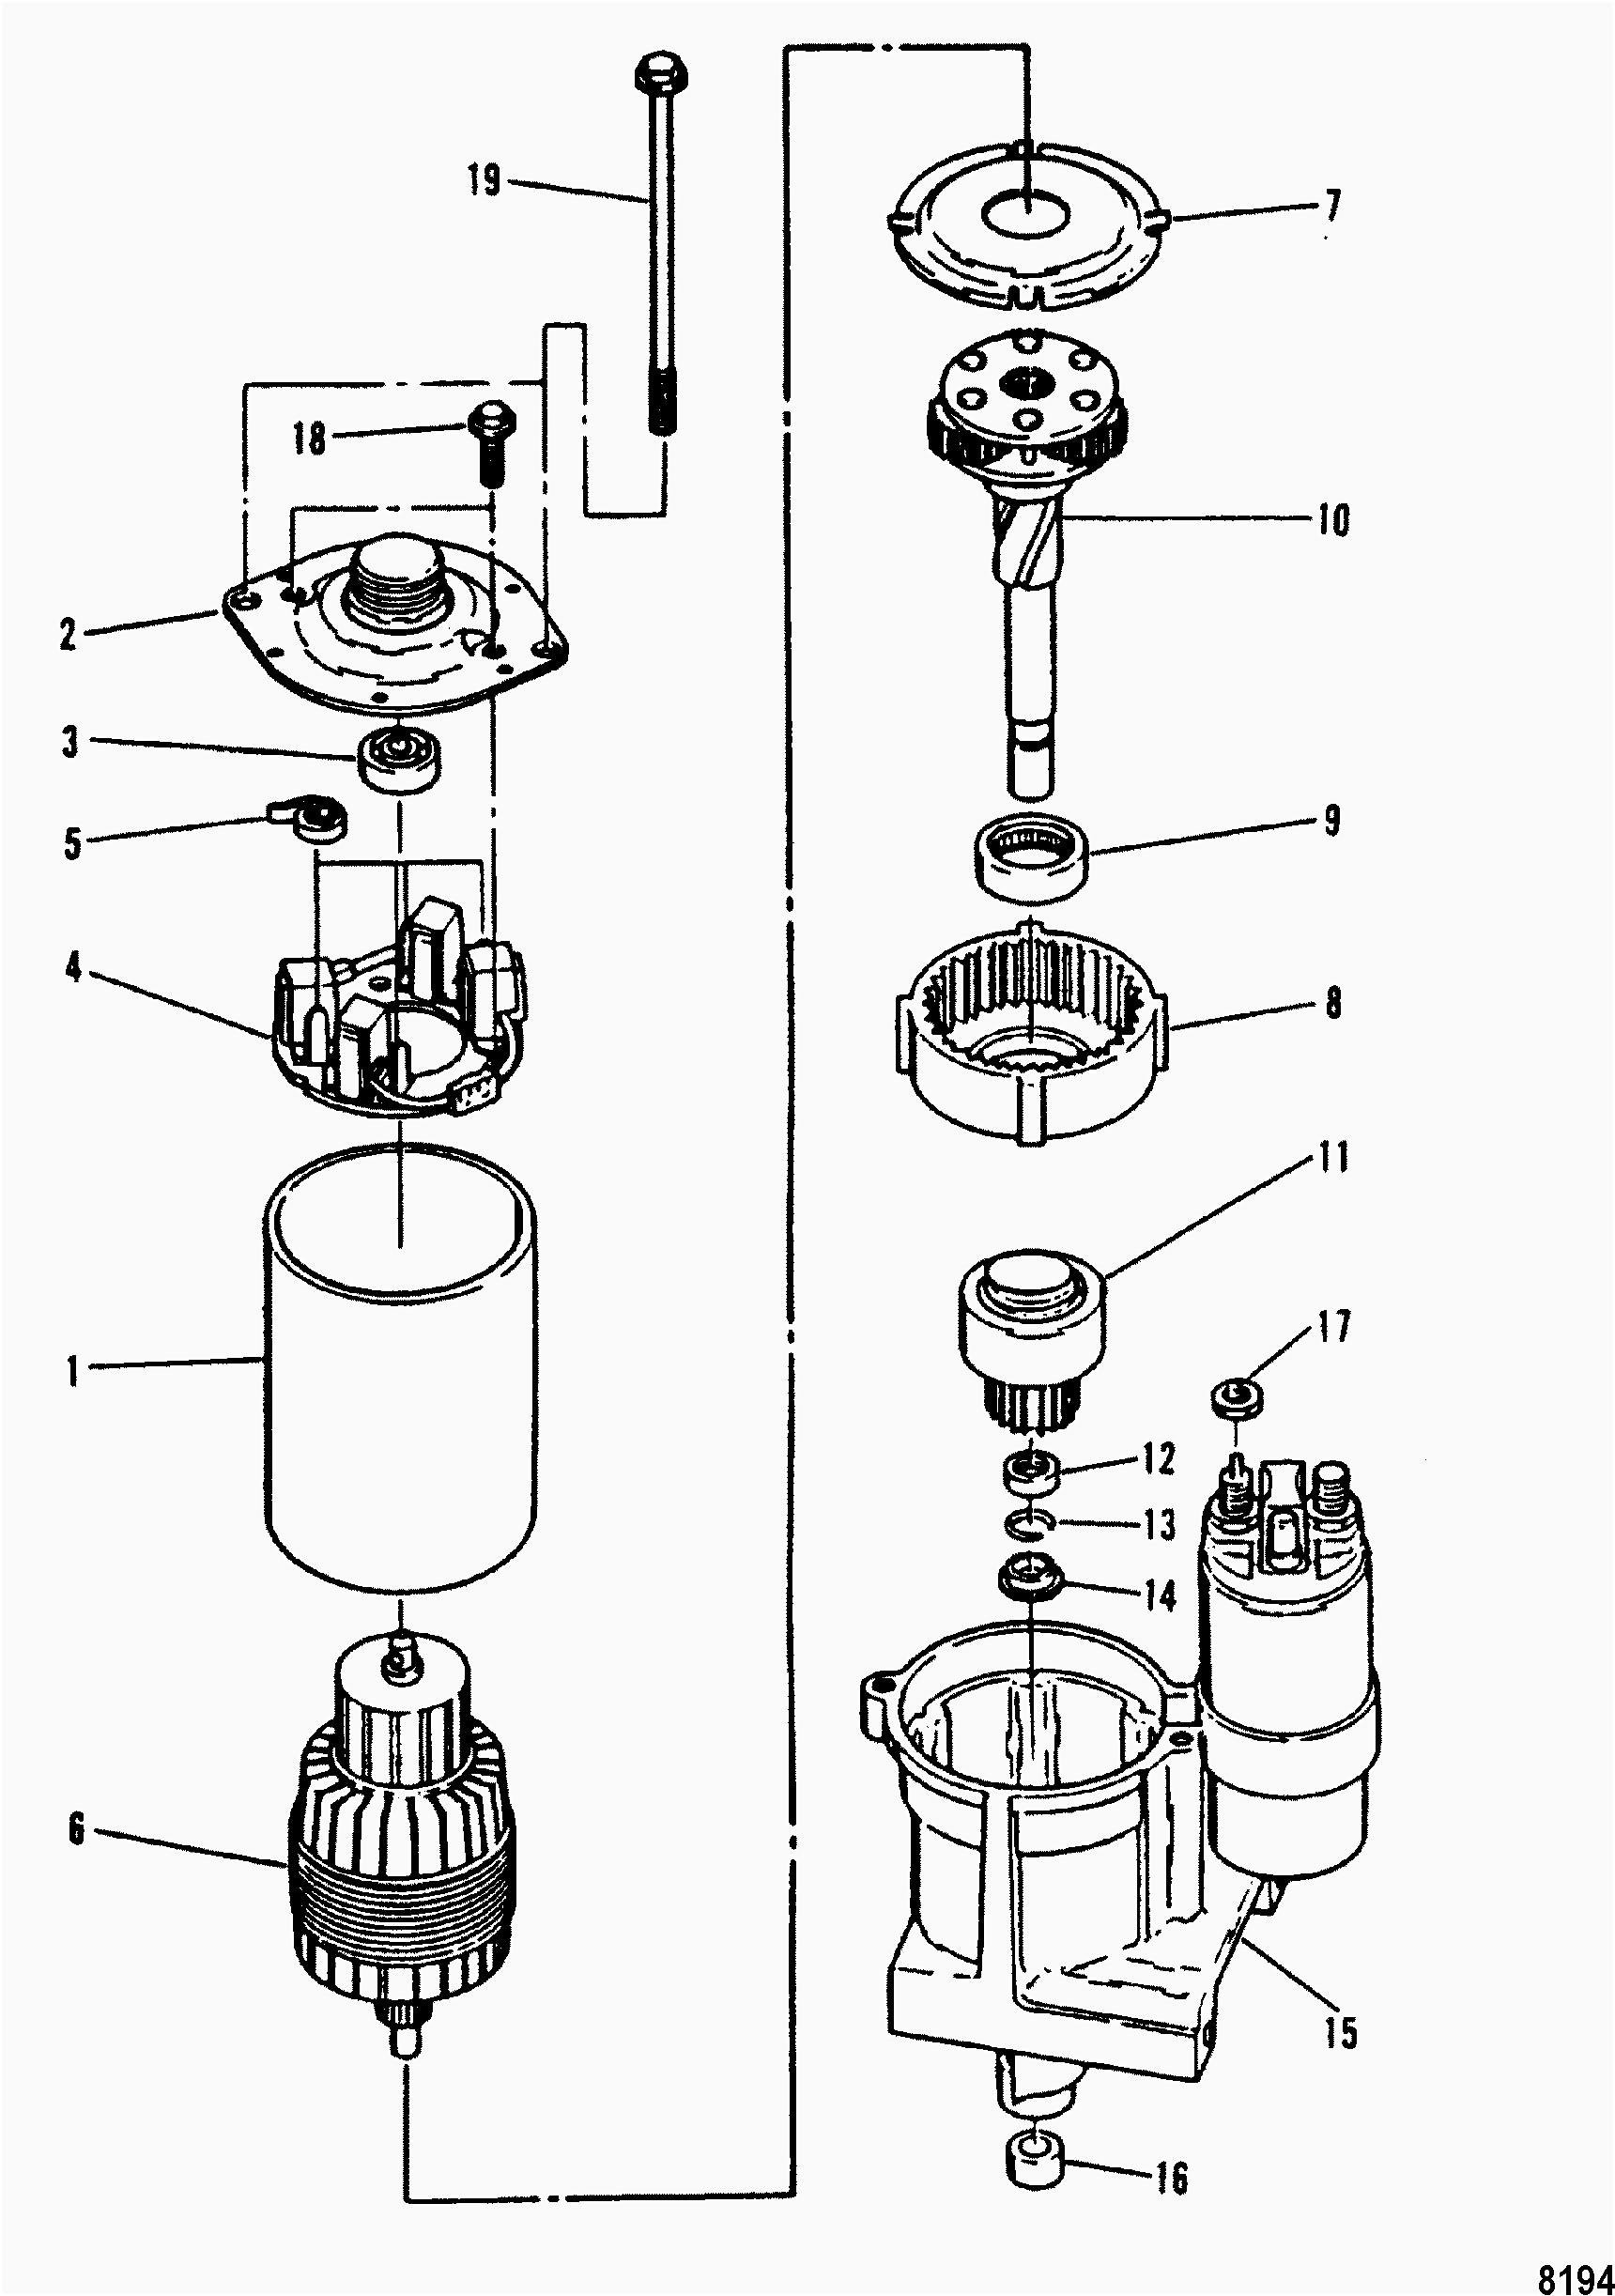 Diagram Common Delco Si Series Alternator Wiring Diagram